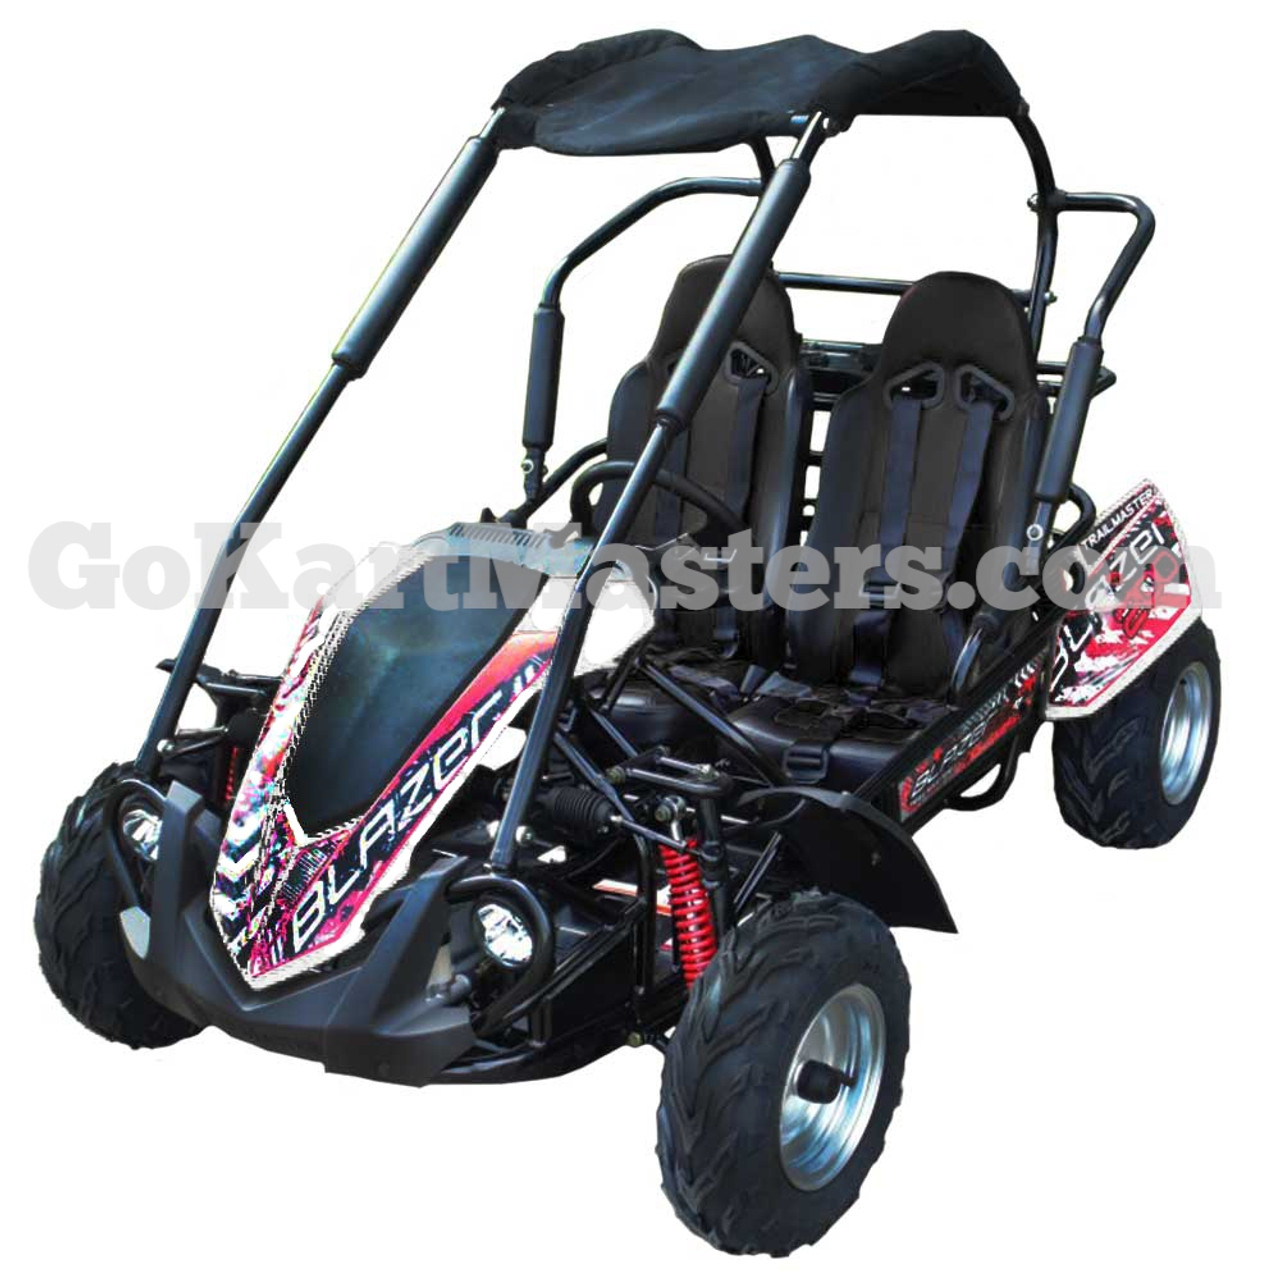 TrailMaster Blazer 200R Go Kart w/ Reverse - White